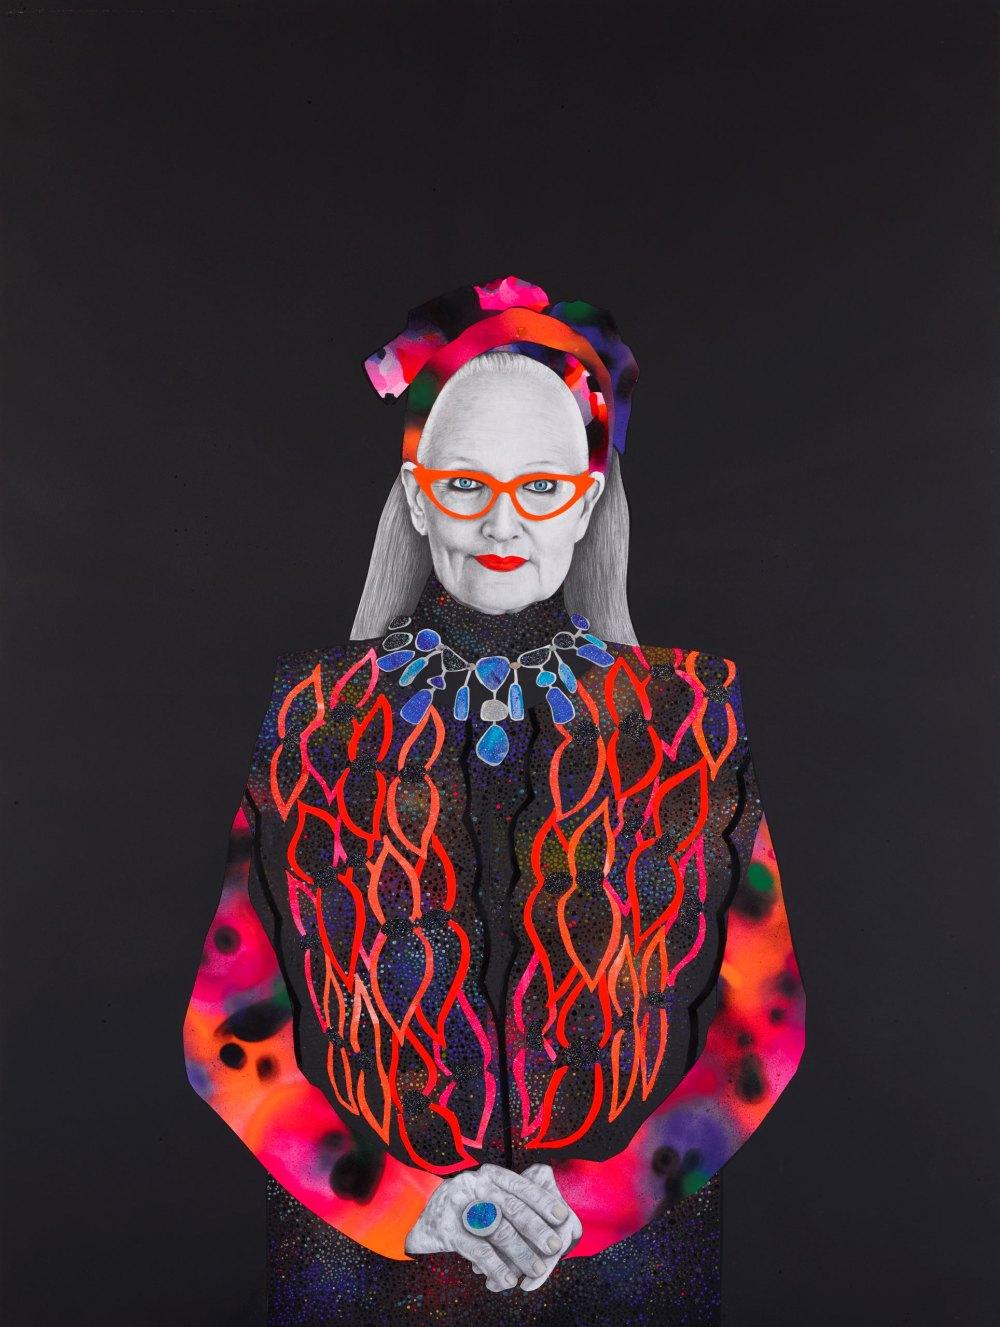 Carla Fletcher - Twin souls, Linda Jackson